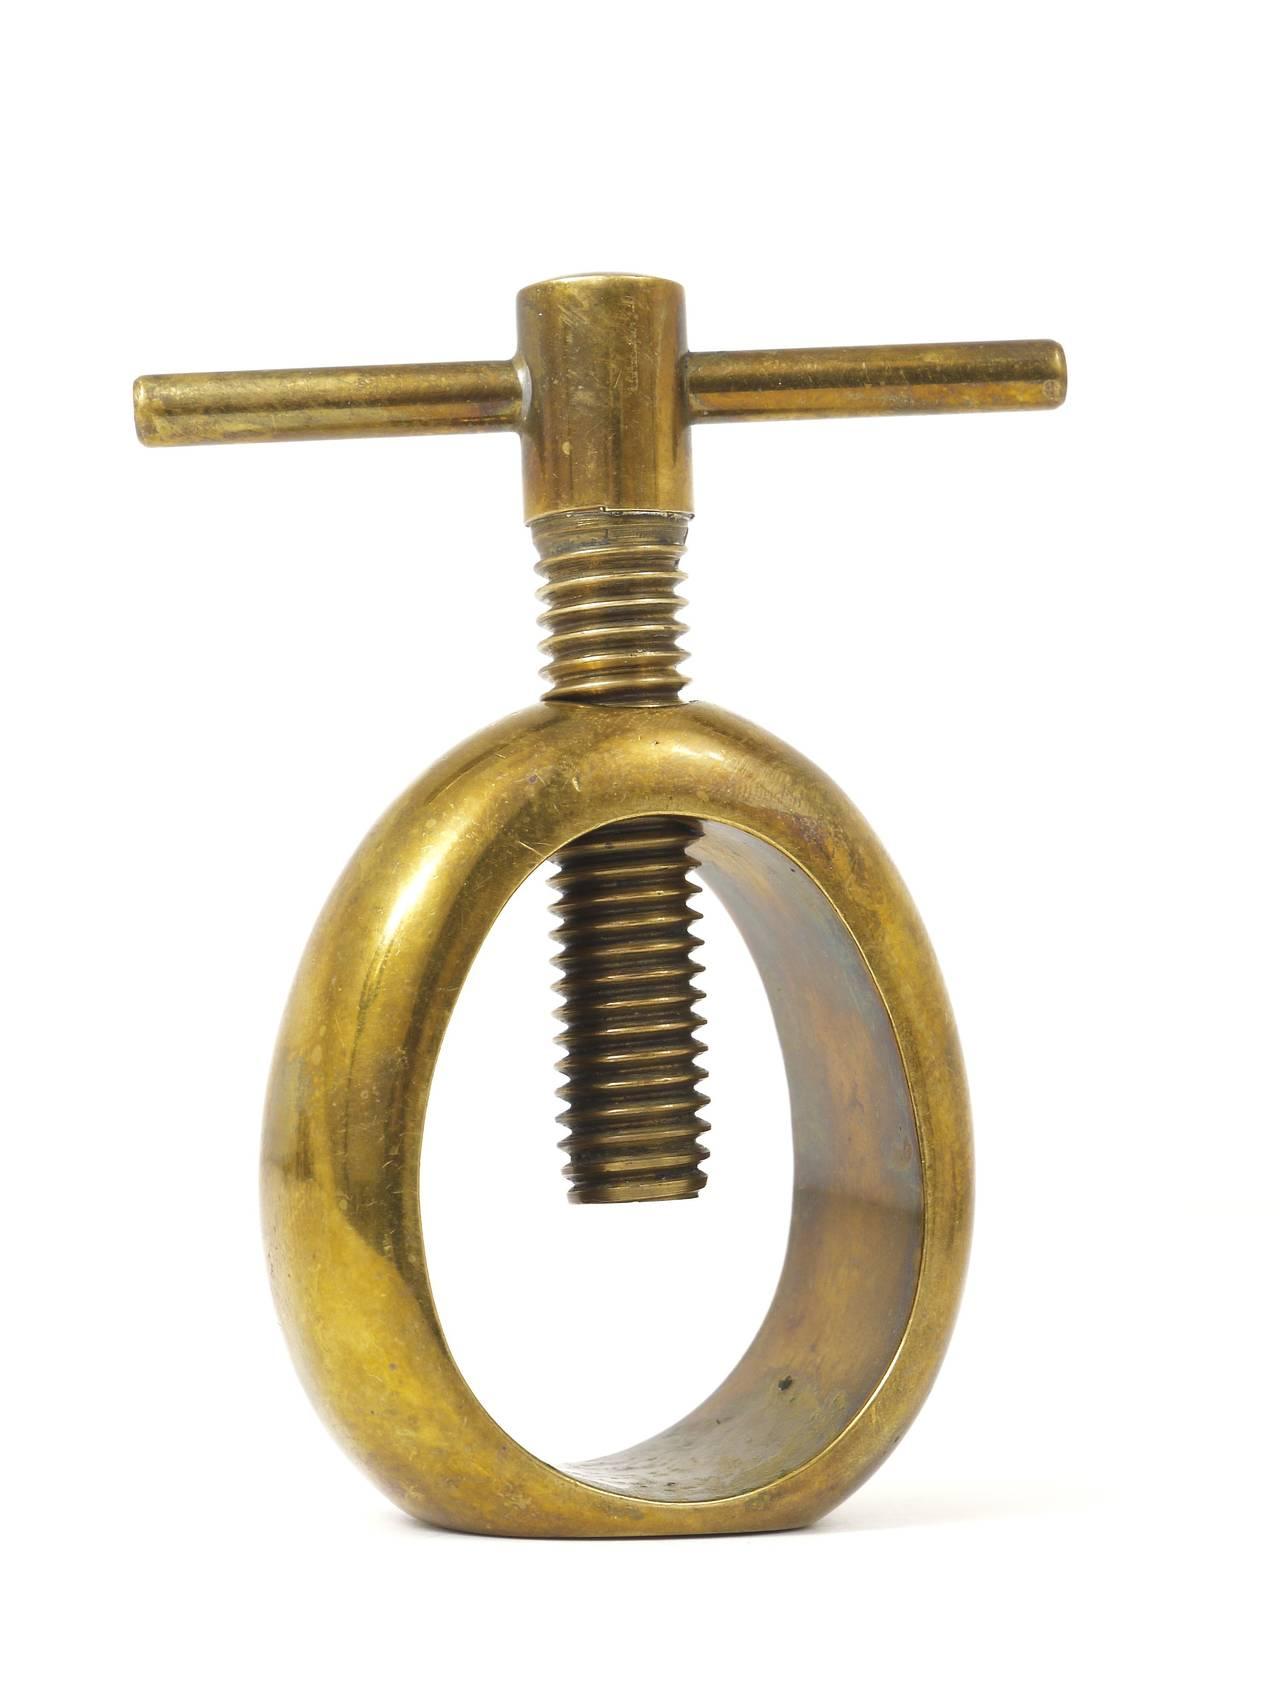 Mid-Century Modern Carl Auböck Midcentury Brass Nut Cracker, Austria, 1950s For Sale